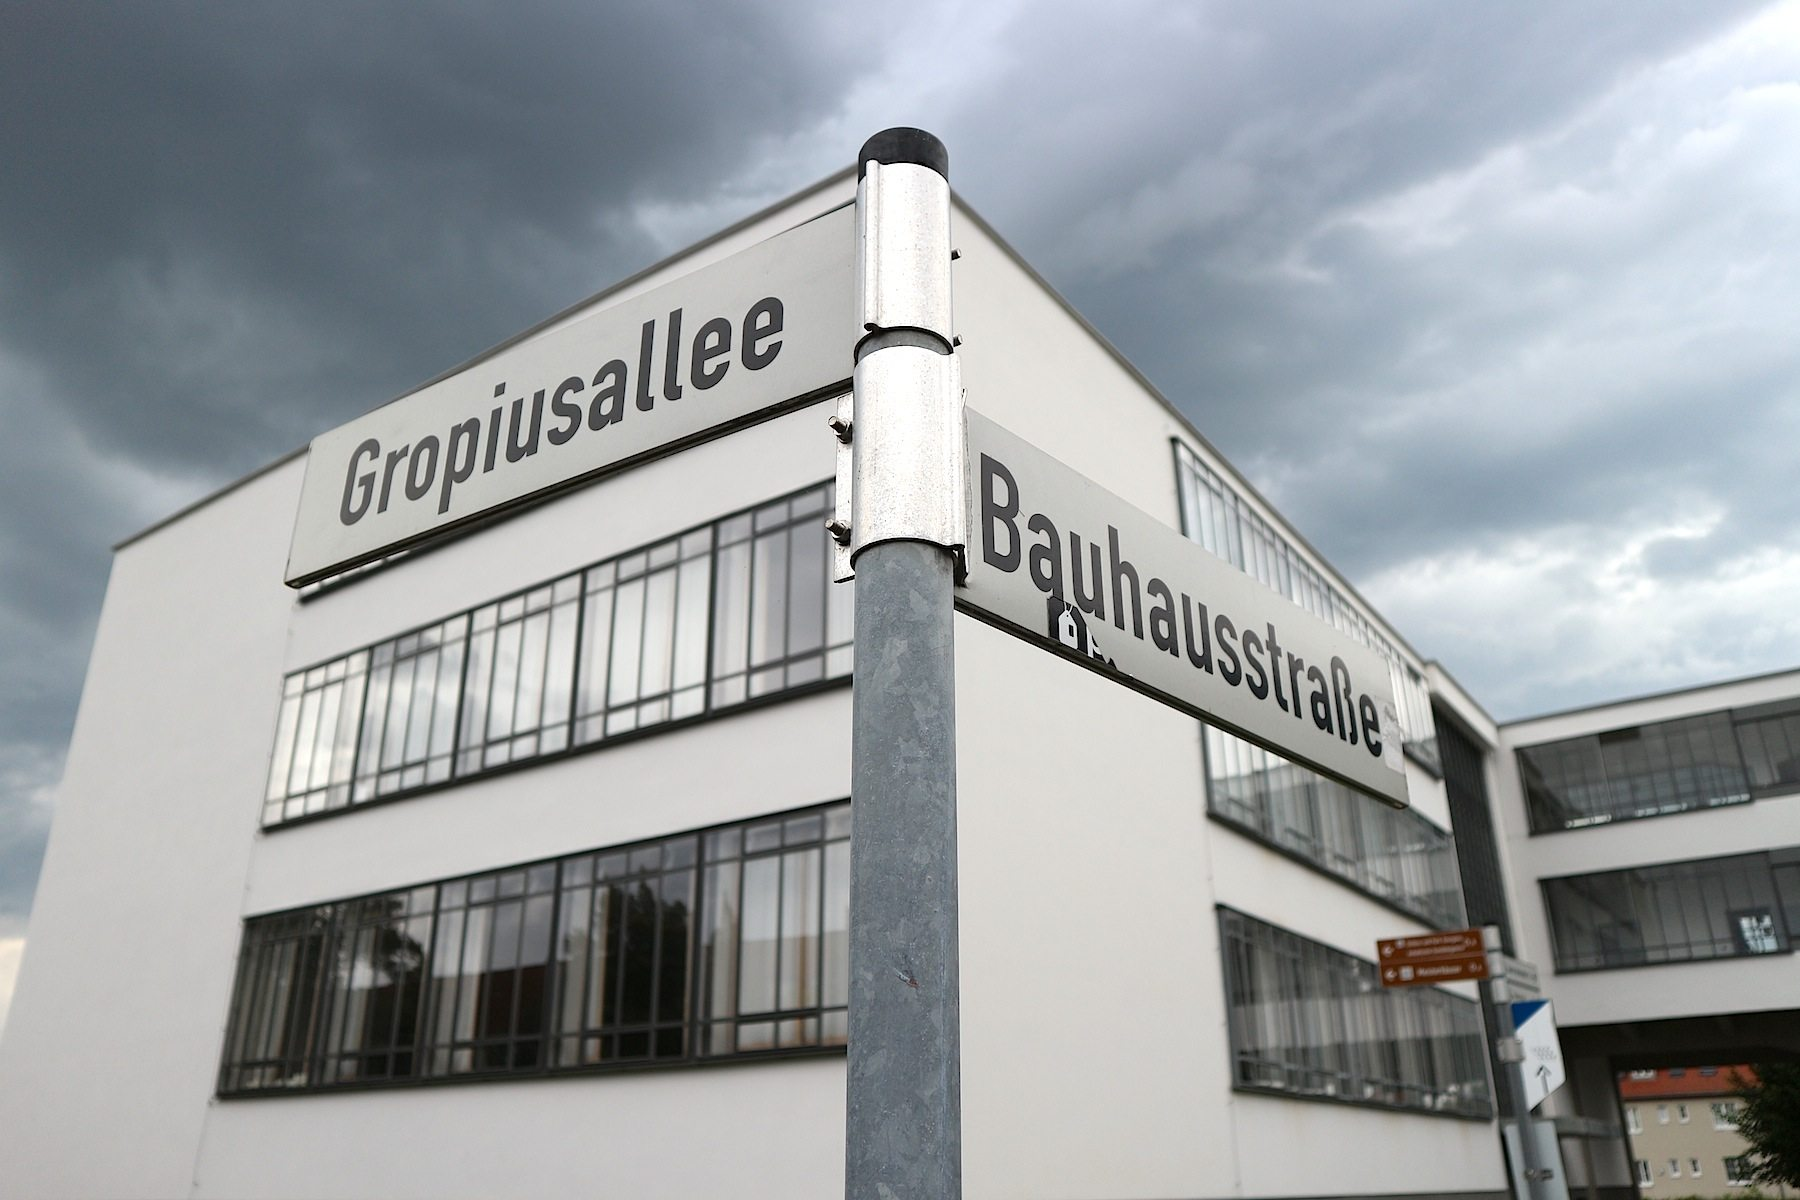 bautopia dessau deutschland the link stadt land architektur. Black Bedroom Furniture Sets. Home Design Ideas